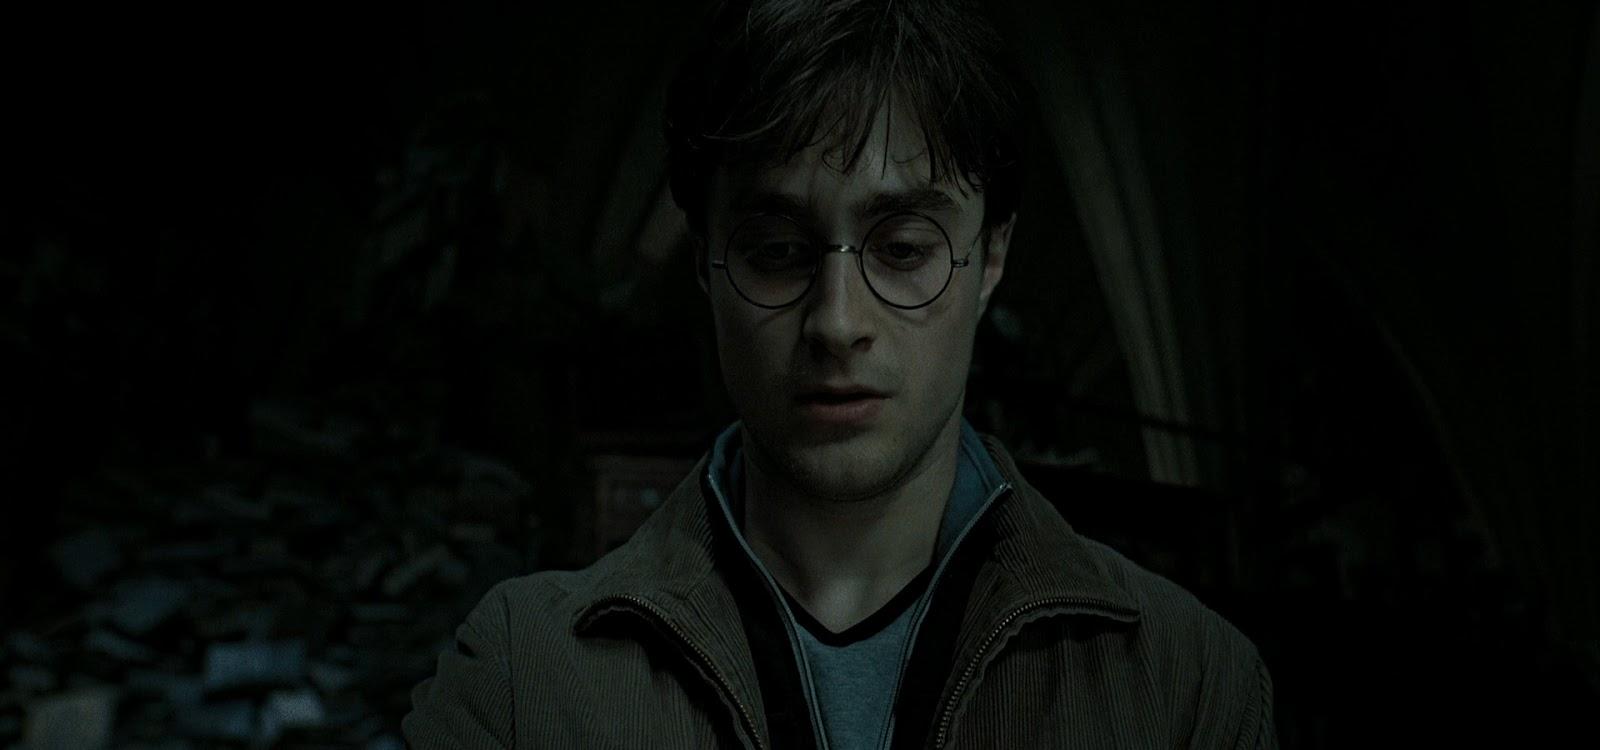 Harry Potter 7 Parte 2 HD 1080p Latino 60fps captura 2